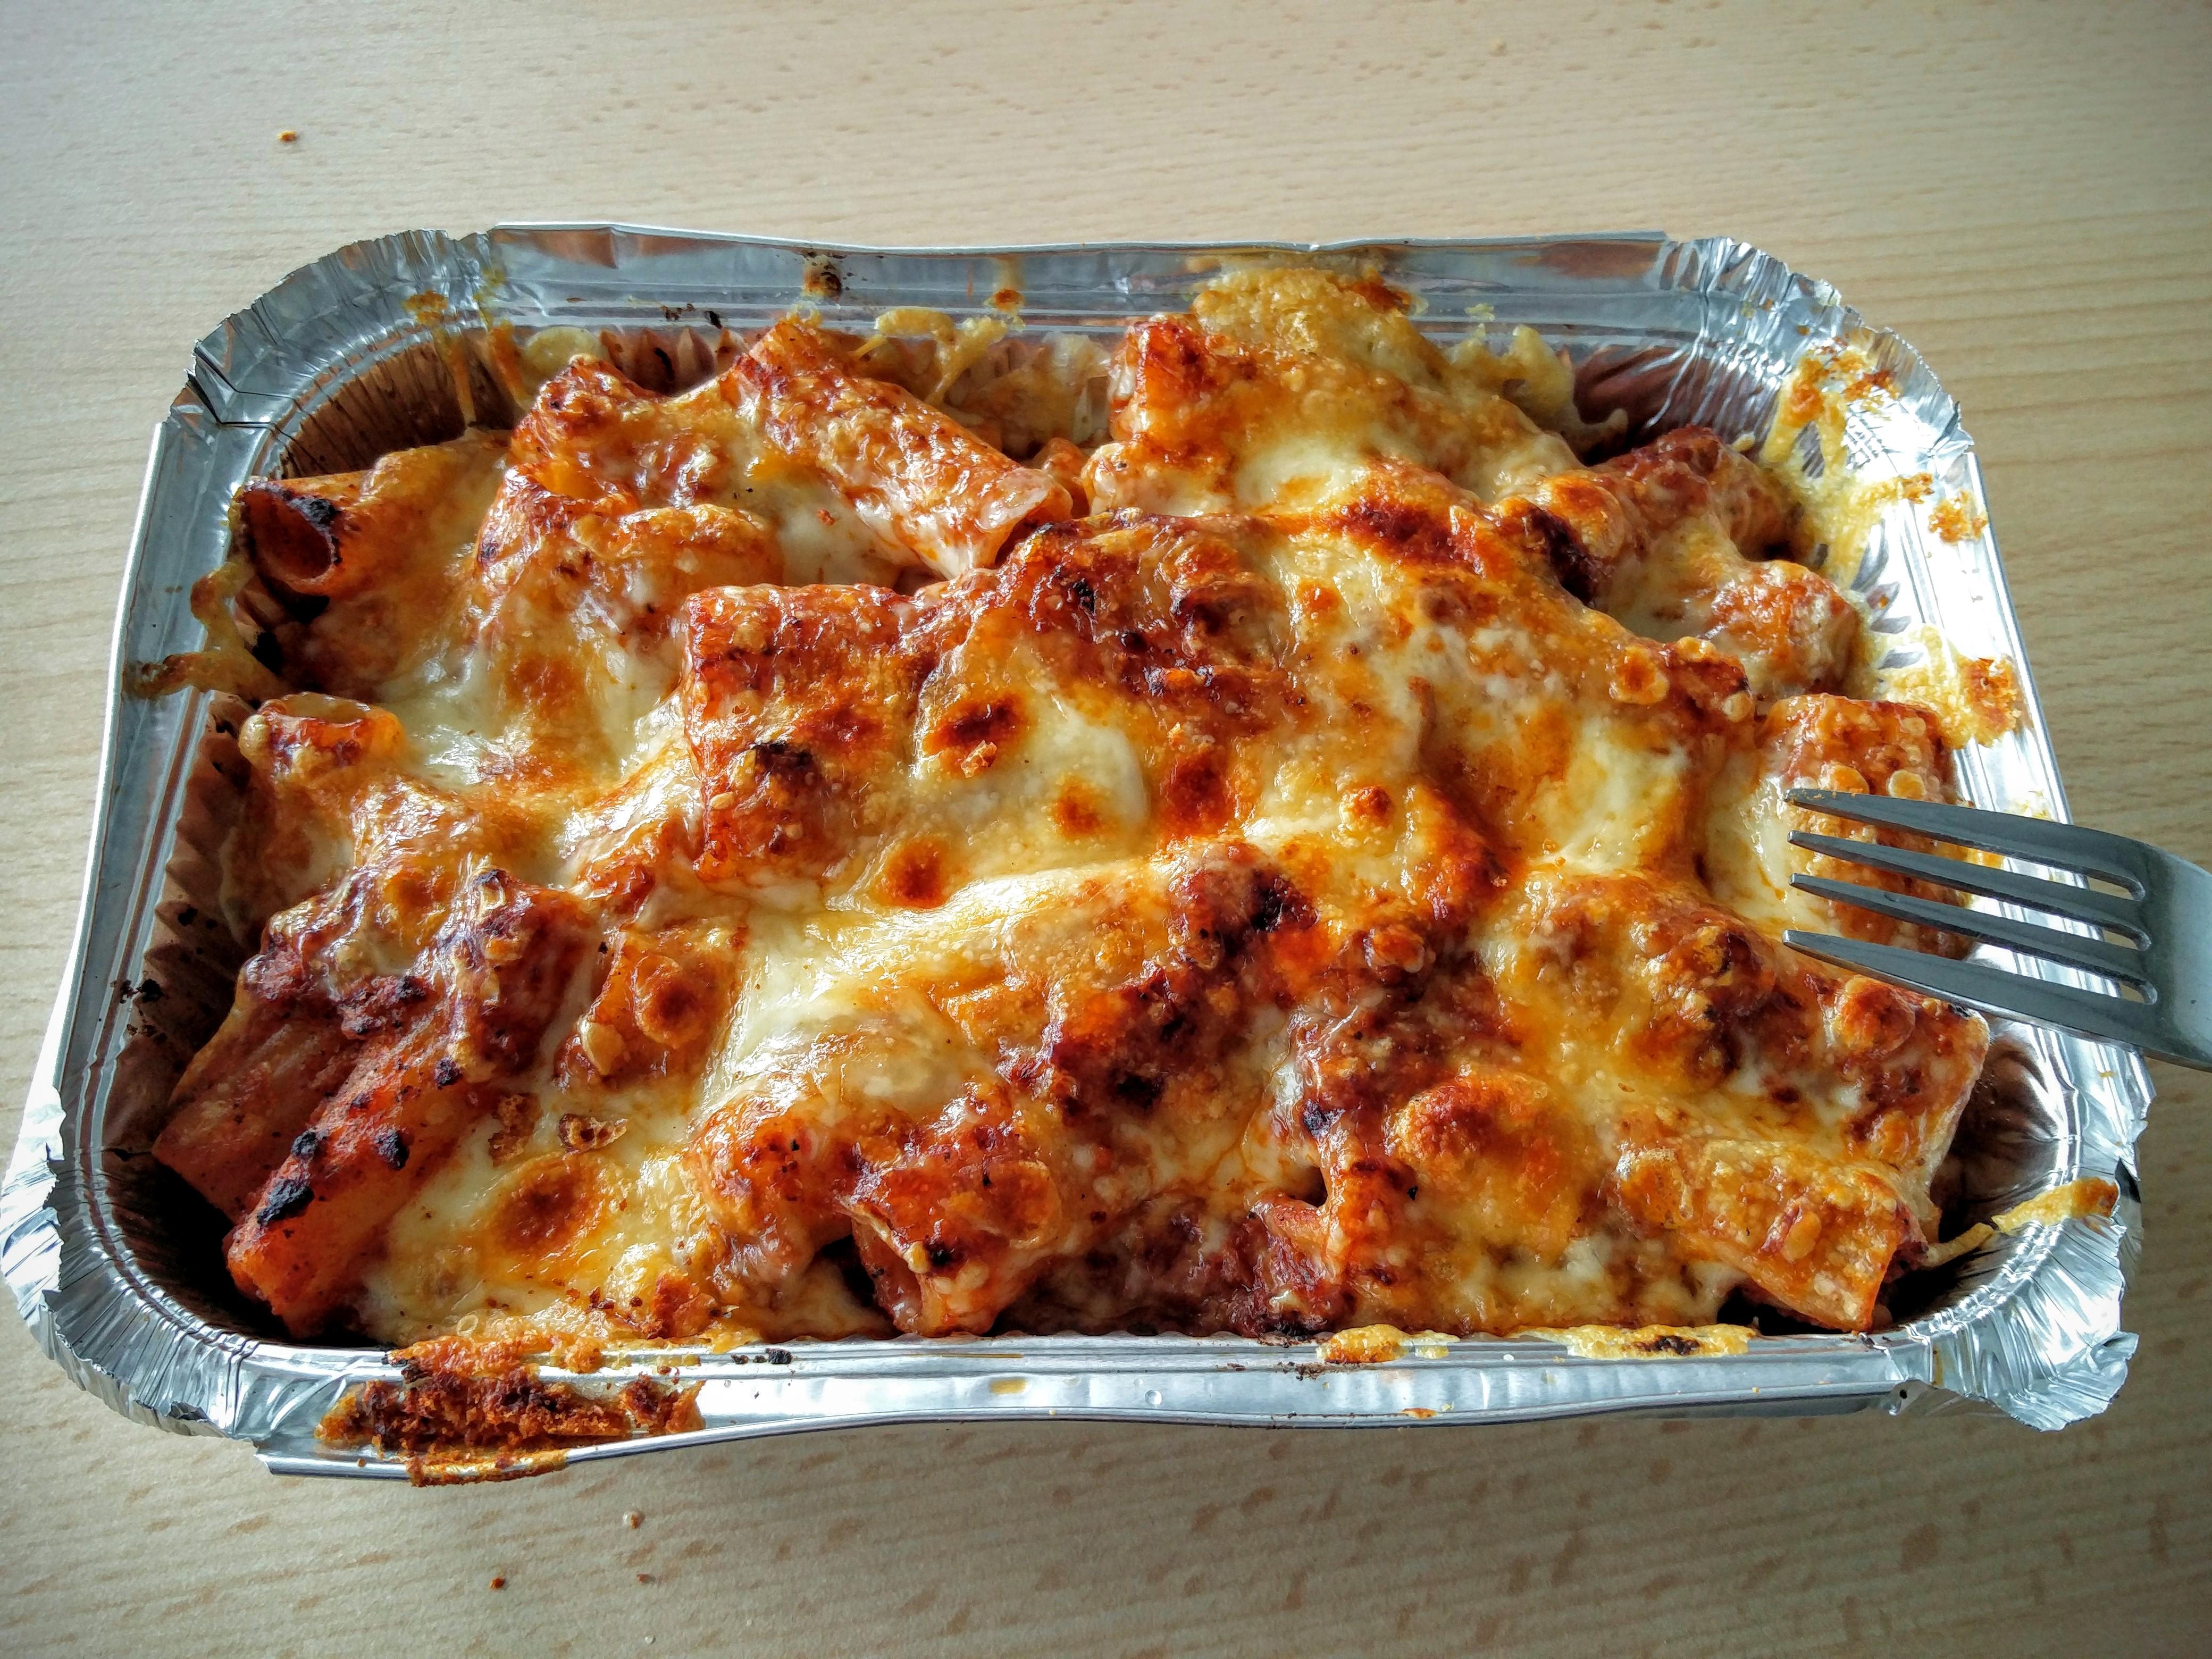 http://foodloader.net/nico_2015-12-02_rigatoni-al-forno.jpg